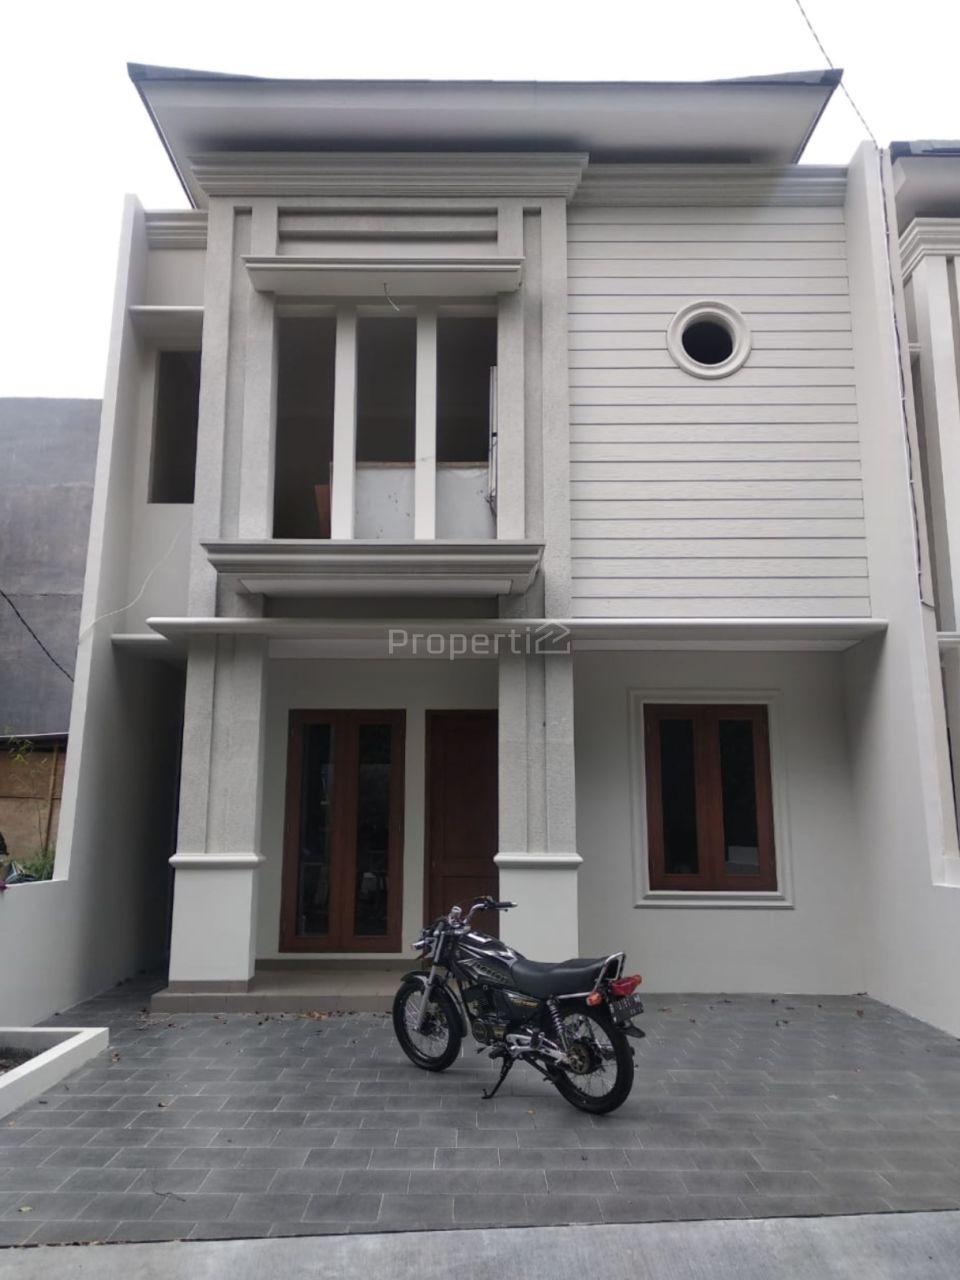 Rumah Brand New di Lebak Bulus, DKI Jakarta